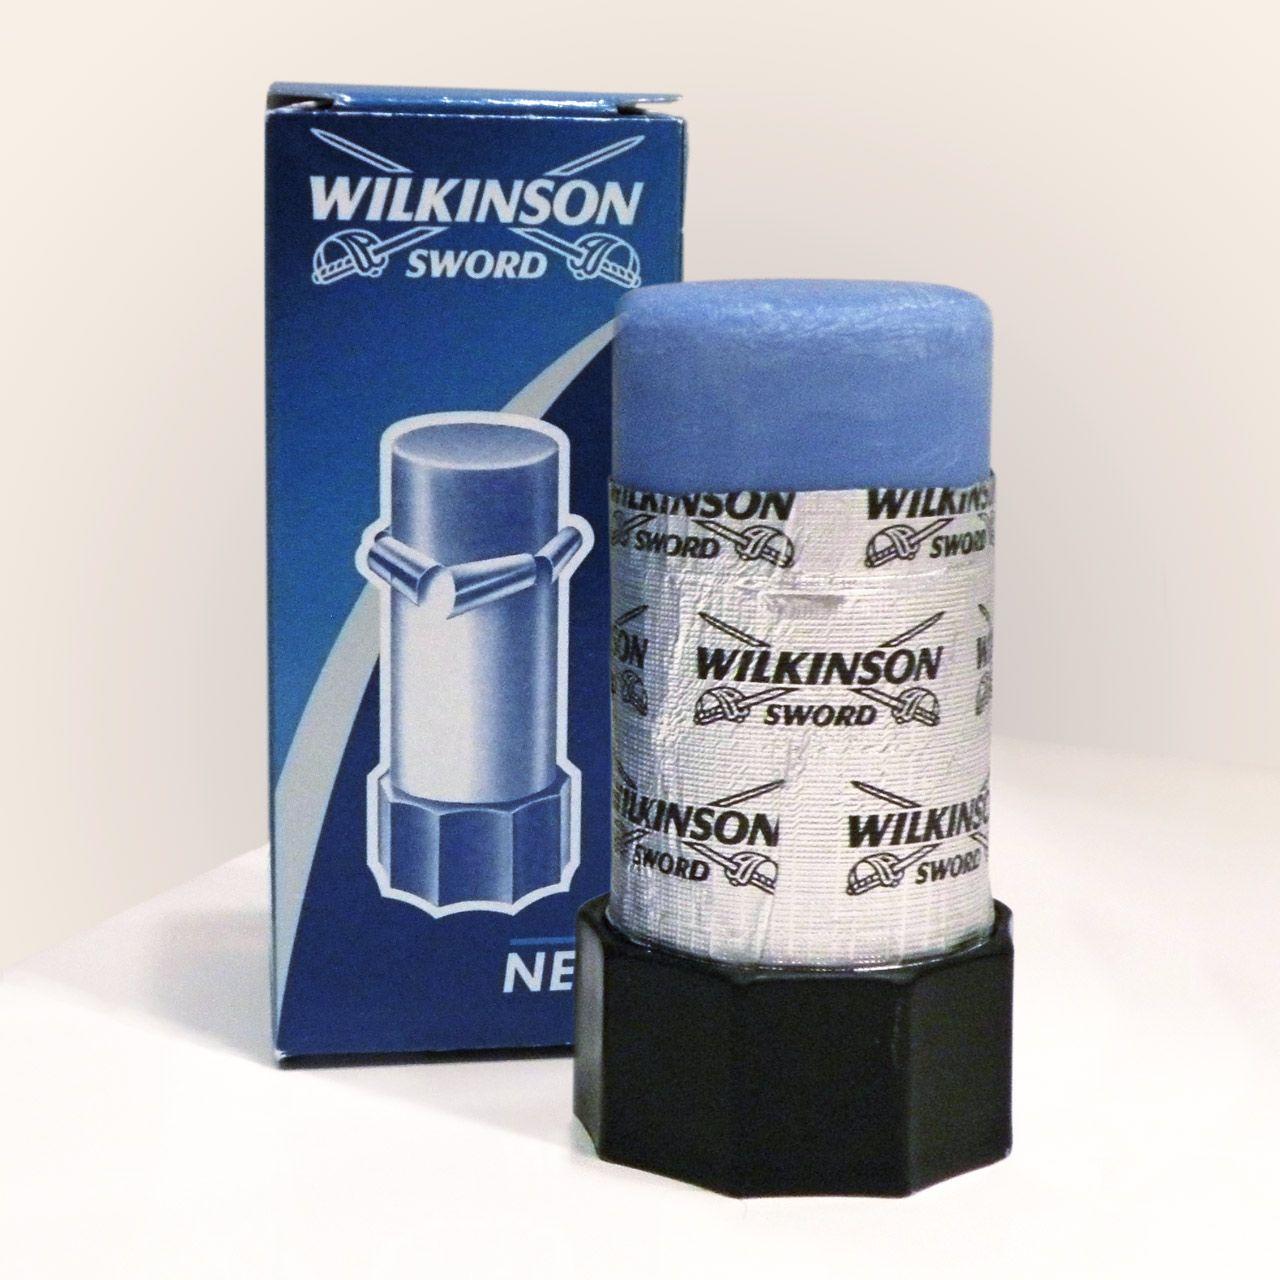 Sztyft do golenia Wilkinson Sword